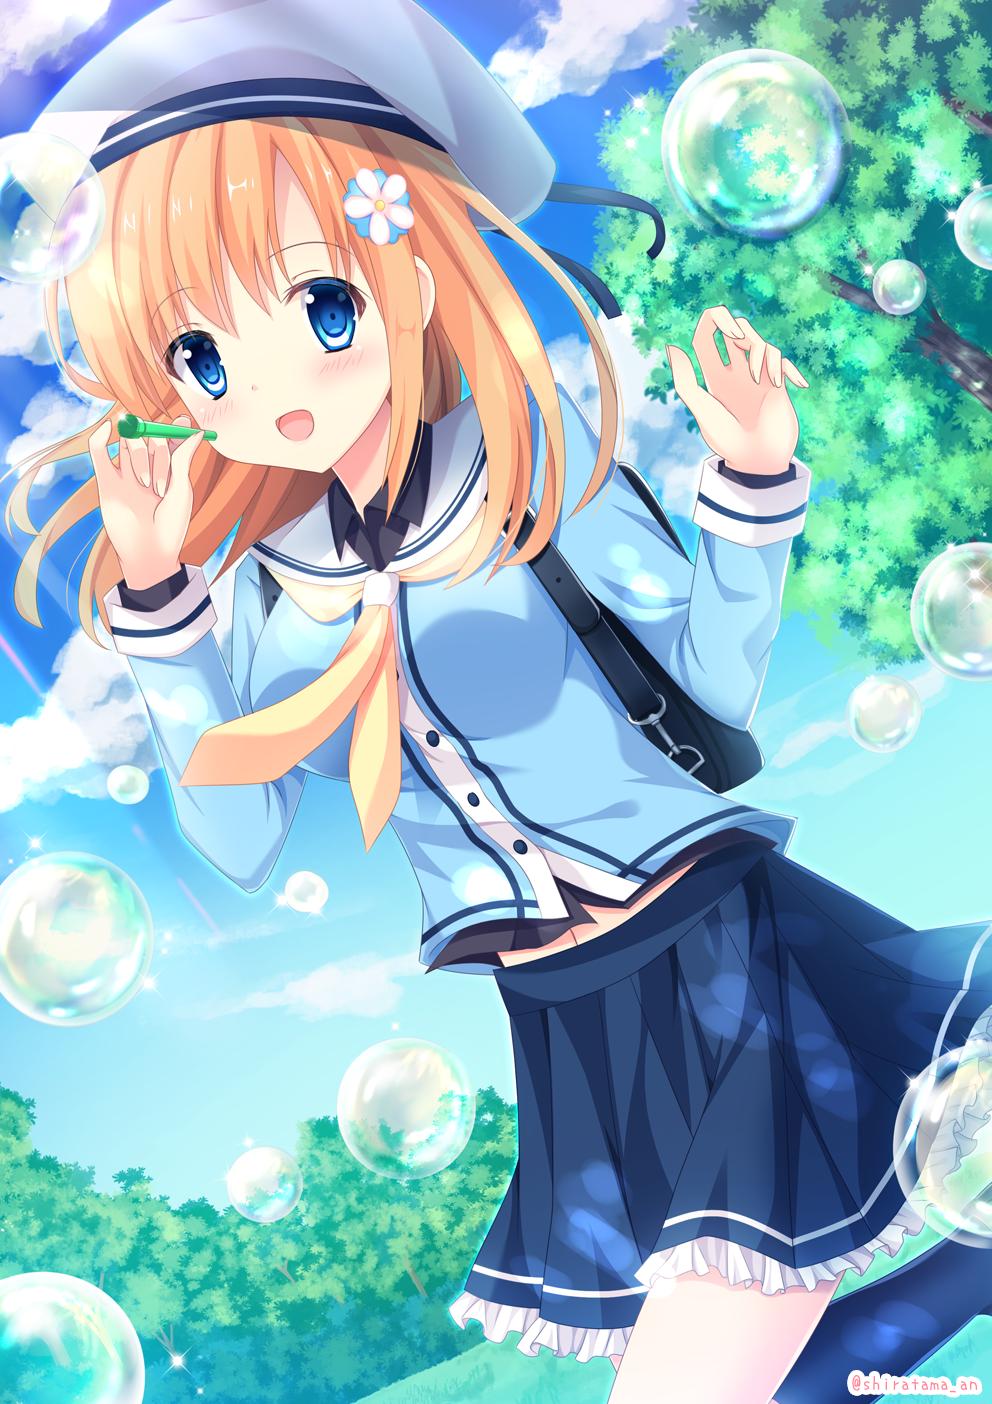 anime girls おしゃれまとめの人気アイデア pinterest argos2 0 イラスト かわいい アニメ